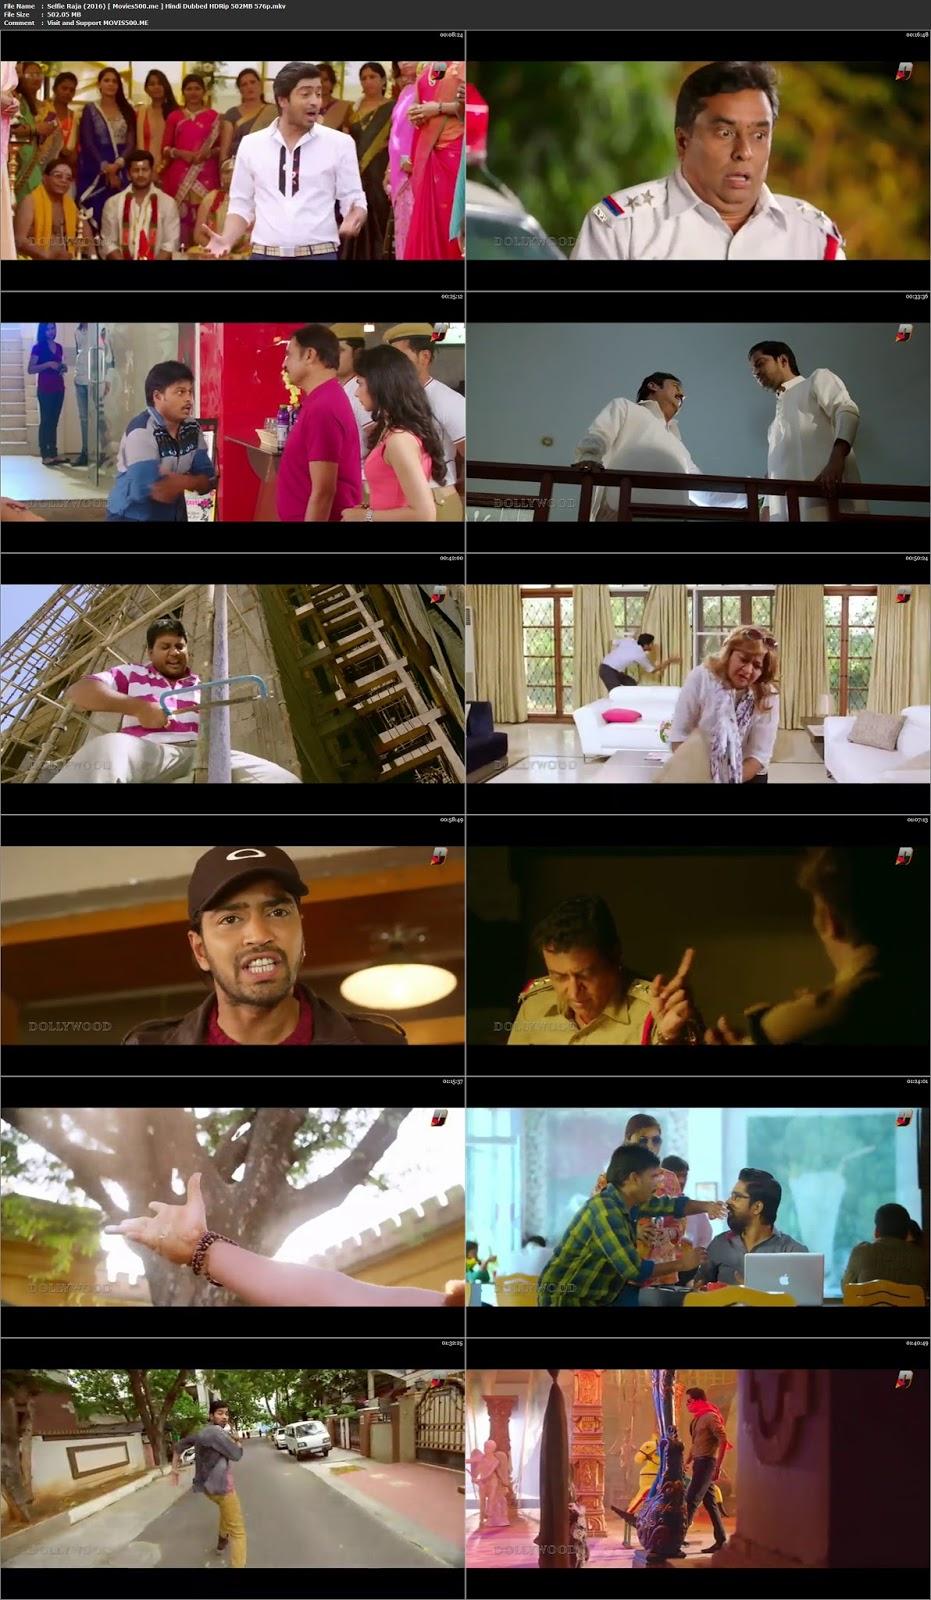 Selfie Raja 2016 Hindi Dubbed HDRip 502MB 576p